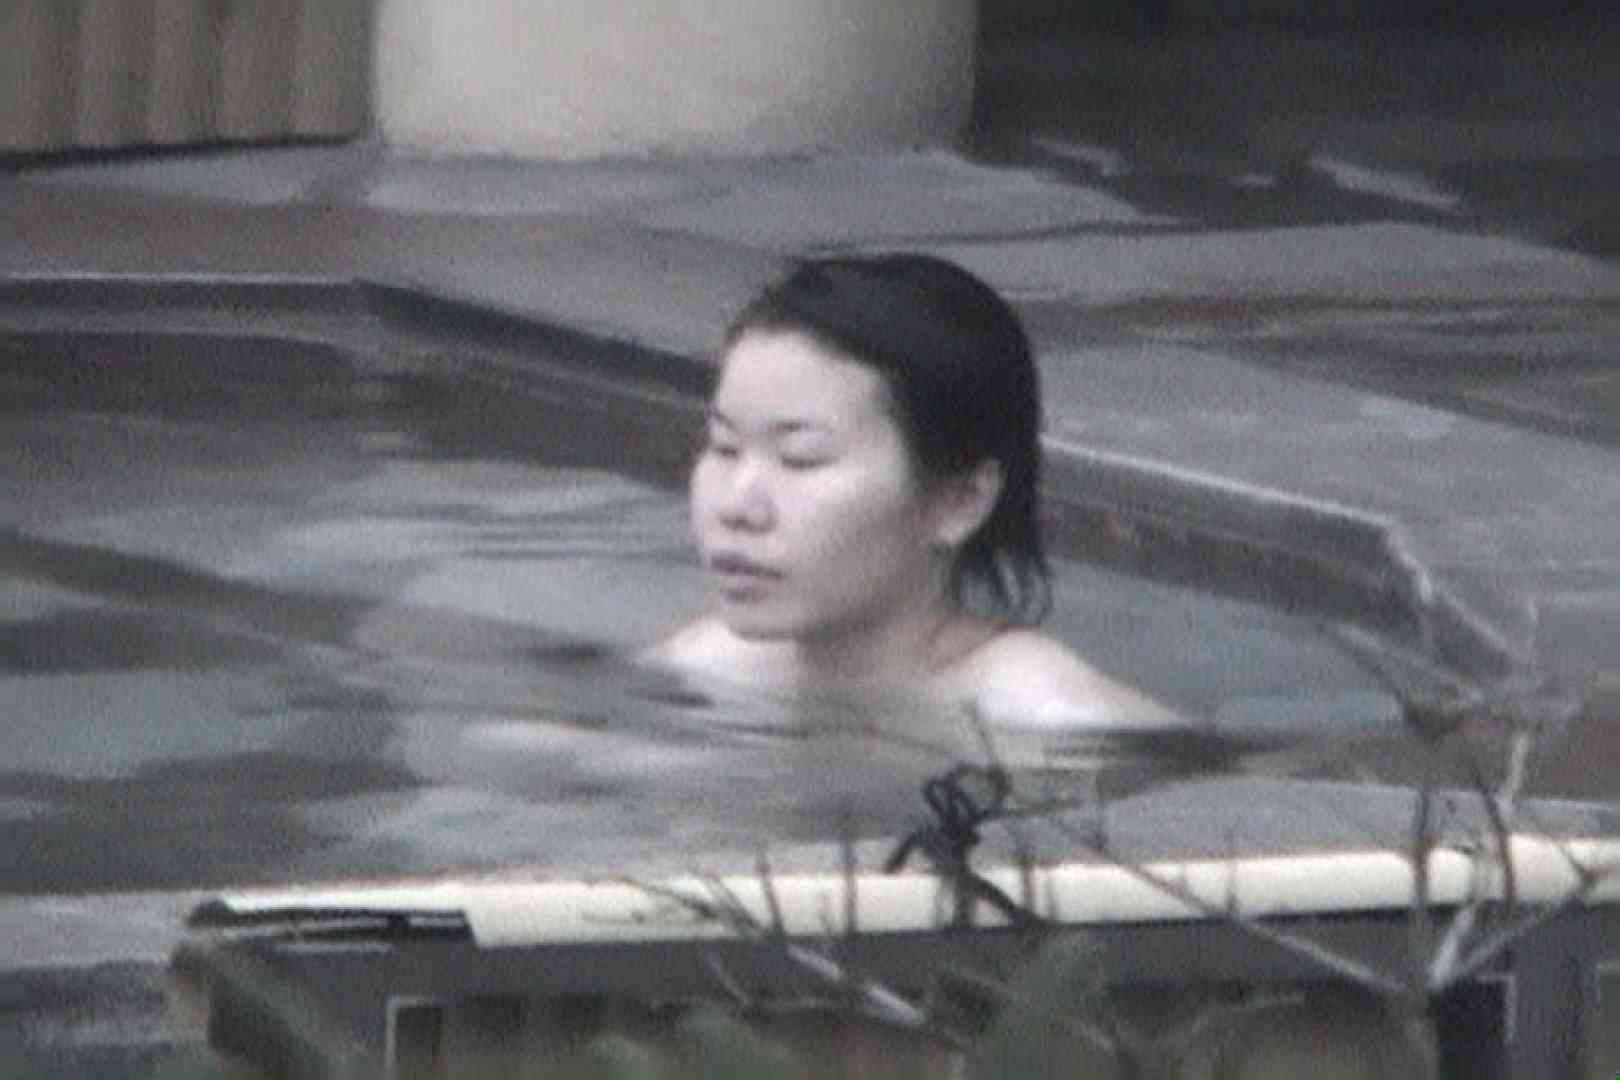 Aquaな露天風呂Vol.556 露天風呂編  99PIX 84